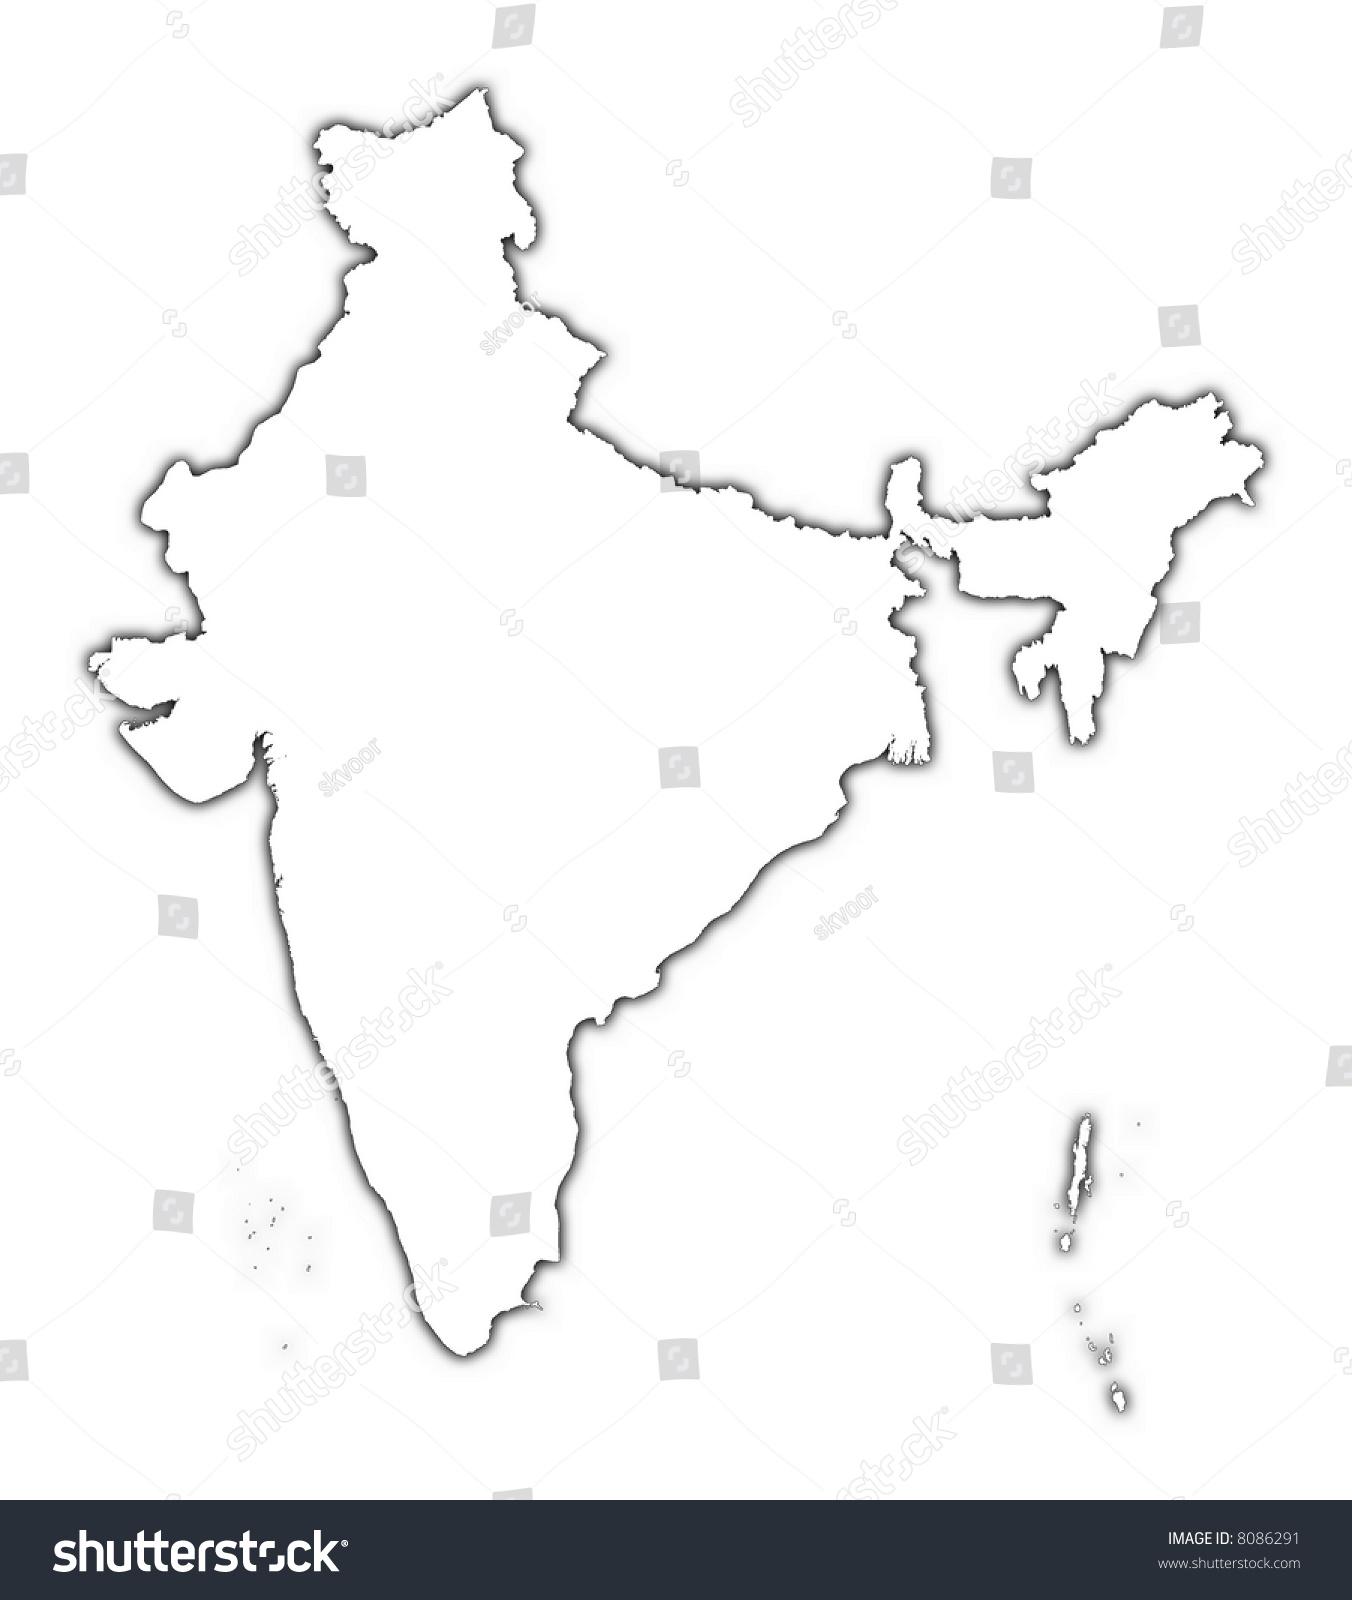 Indian map outline hd pictures - anti federalist vs federalist ... on kerala political map, kerala road map, karnataka tourism map,